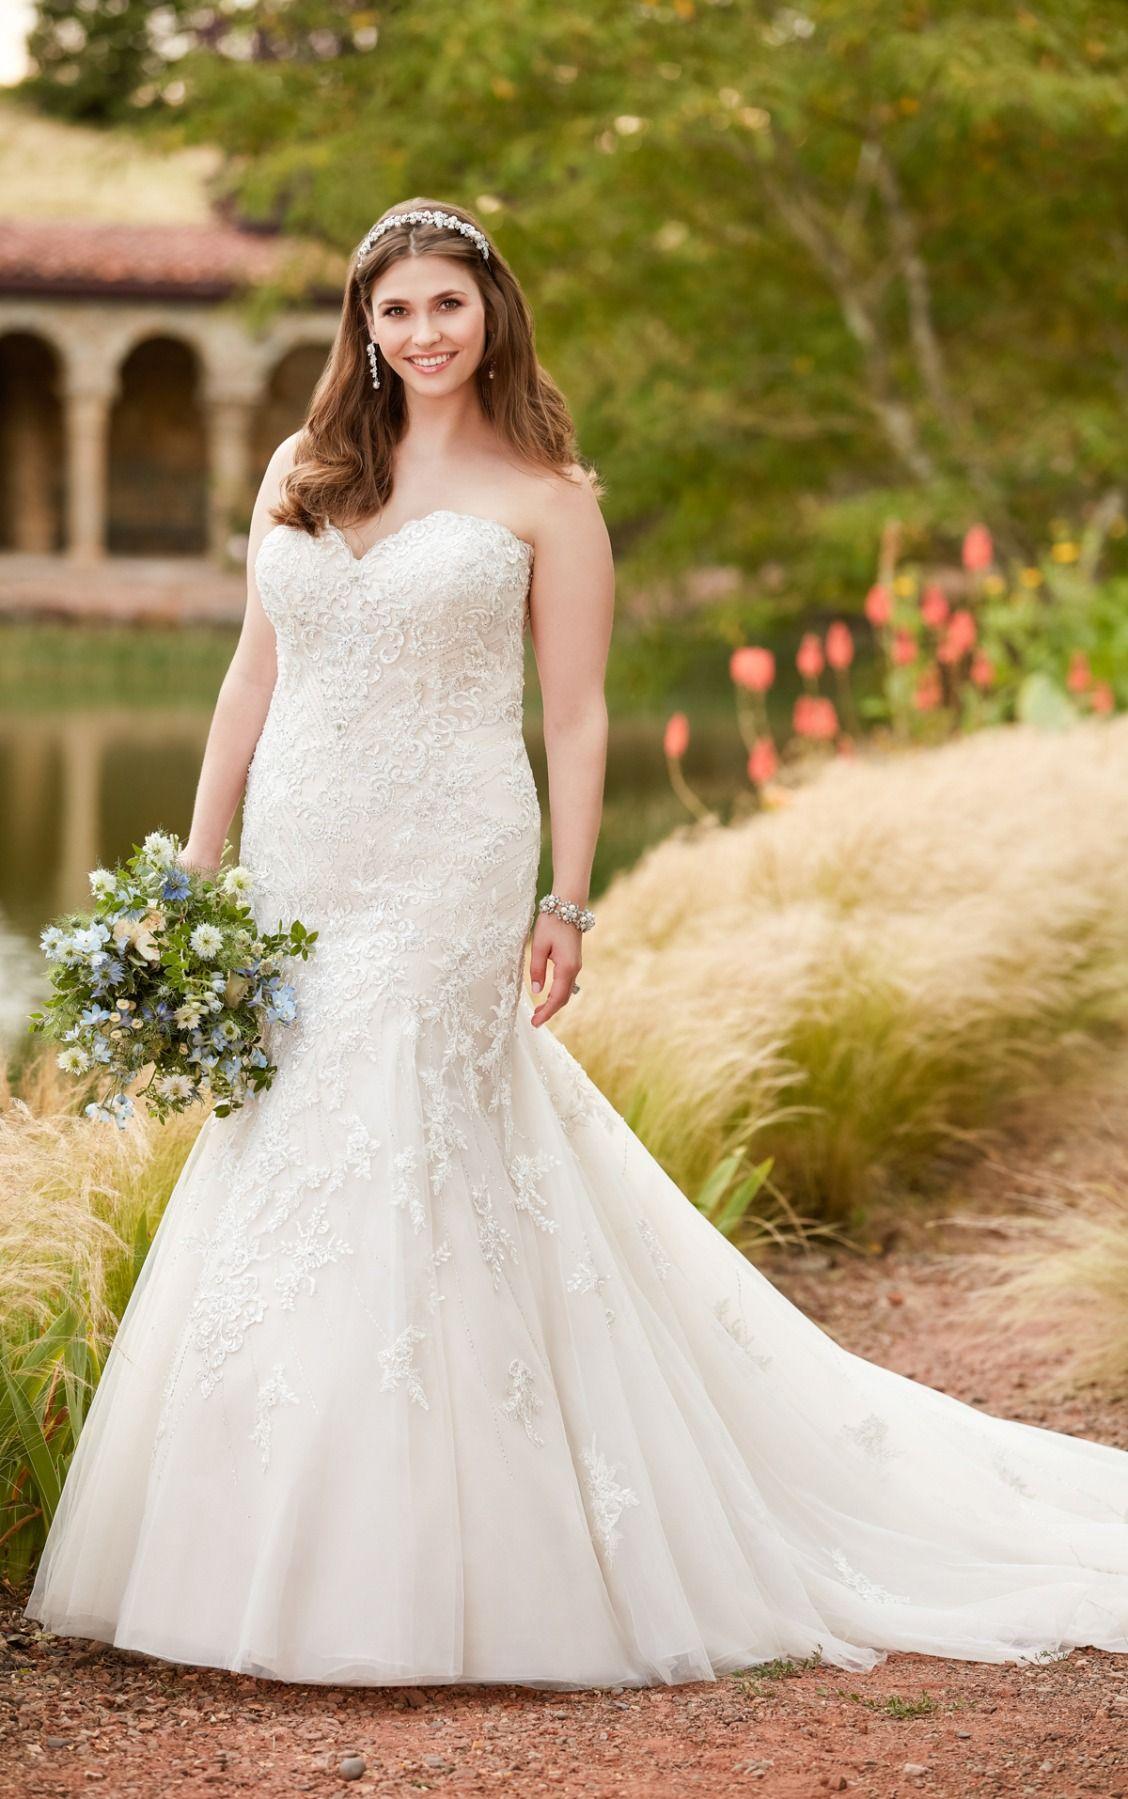 Size 24 wedding dress  Mermaid Wedding Dresses  Mermaid Wedding dress and Weddings